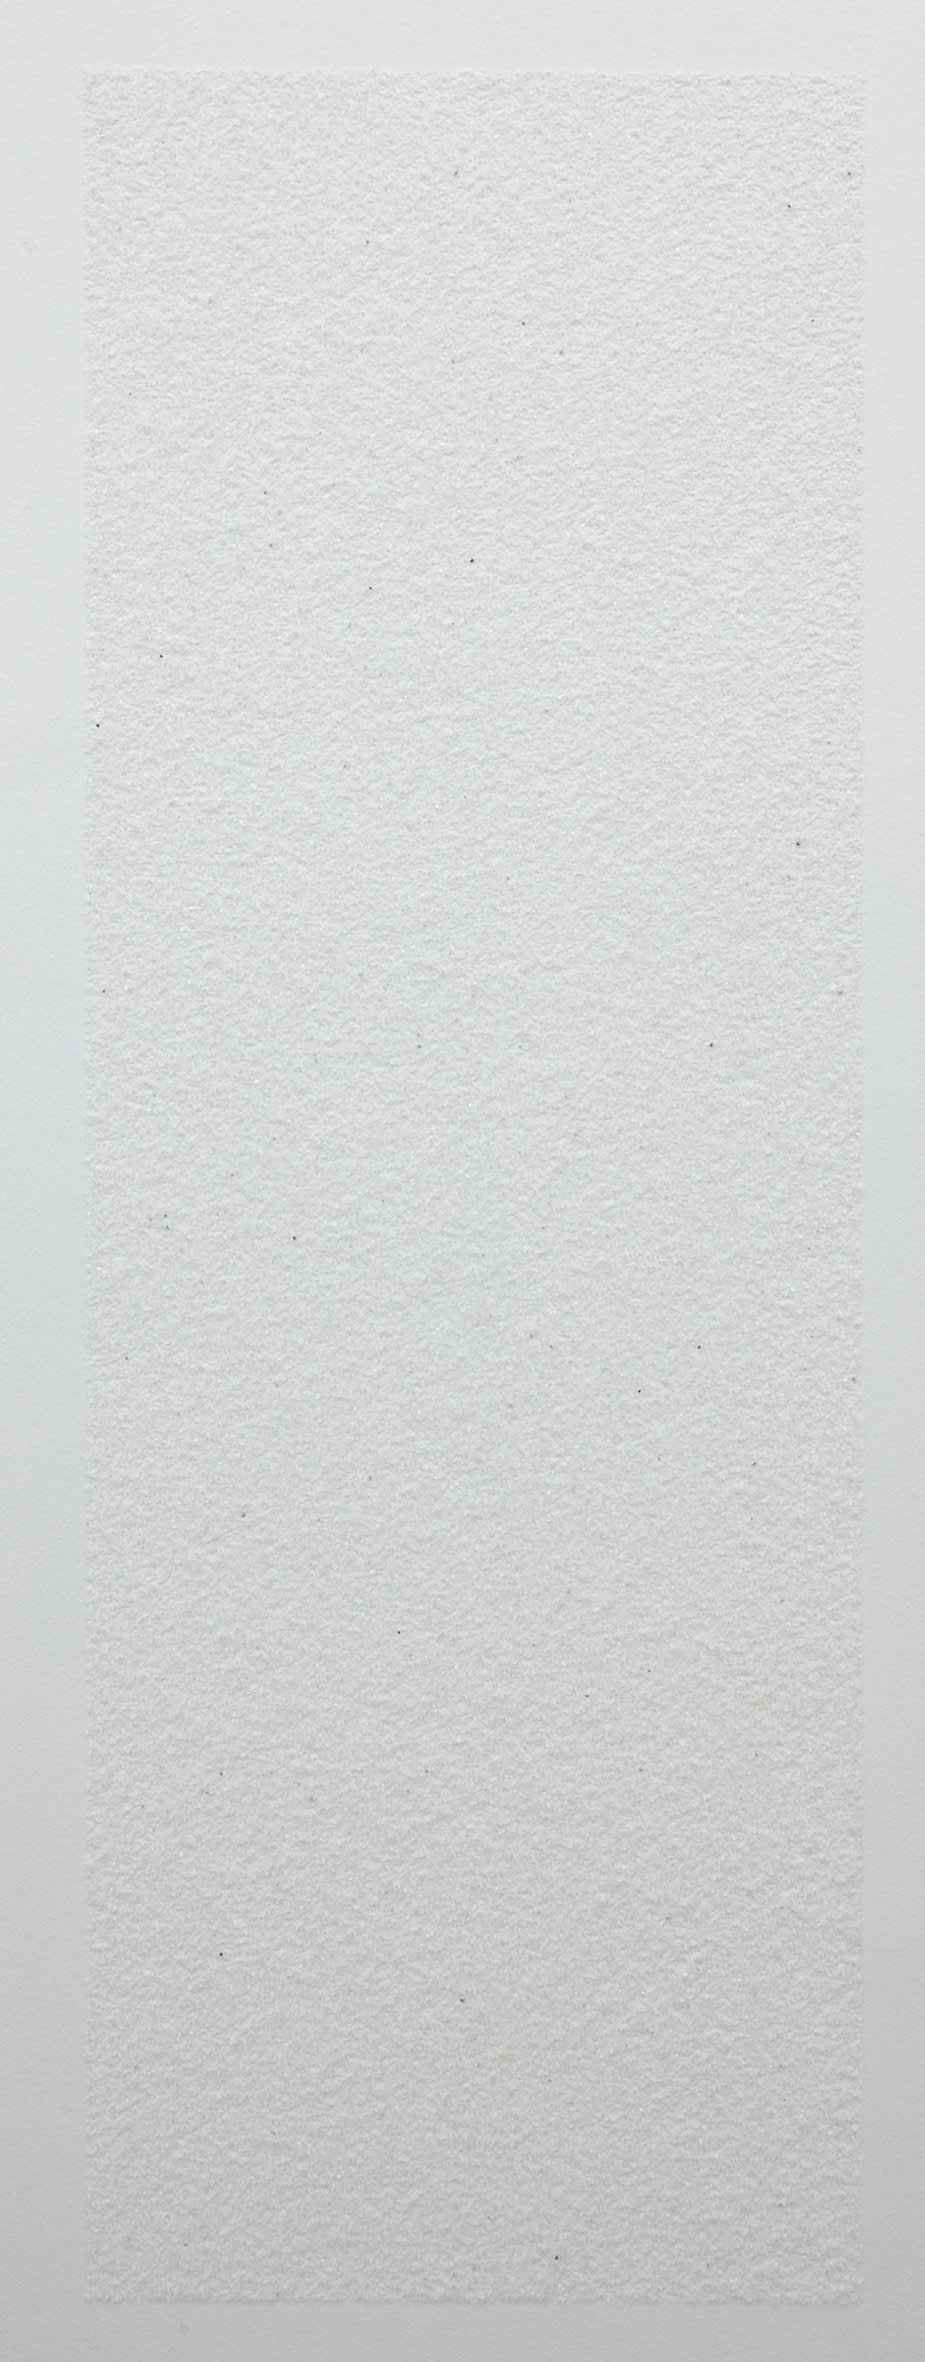 "<span class=""link fancybox-details-link""><a href=""/exhibitions/129/works/artworks9062/"">View Detail Page</a></span><div class=""artist""><strong>RAGNA RÓBERTSDÓTTIR</strong></div><div class=""title""><em>Seascape / Sjávarlandslag</em>, 2013</div><div class=""signed_and_dated"">certificate</div><div class=""medium"">sea salt / sjávarsalt</div><div class=""dimensions"">185.0 x 65.5 cm<br>72 5/16 x 25 1/4 in</div>"